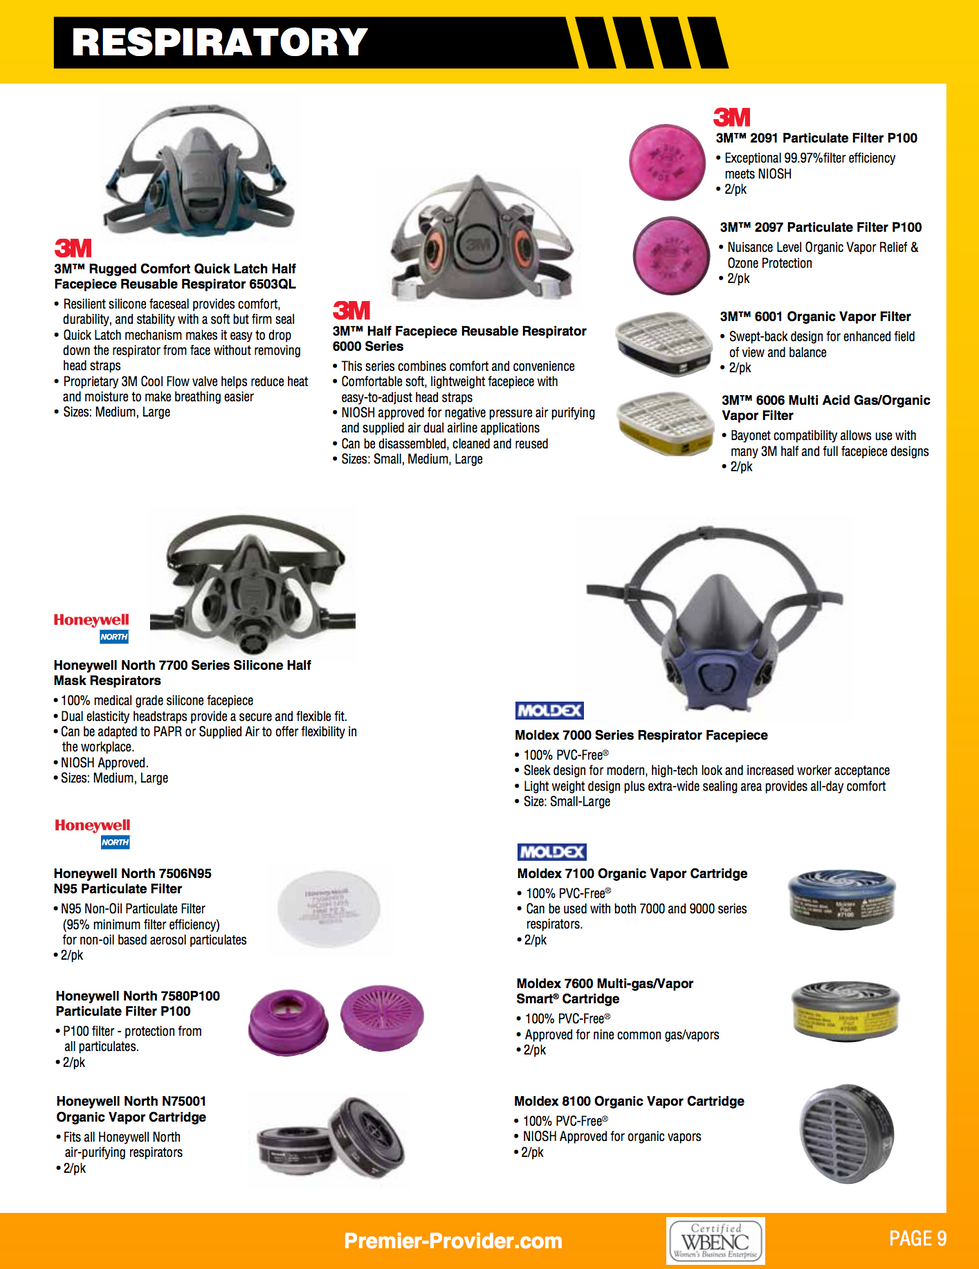 Page 9 Construction catalog wix pics.png